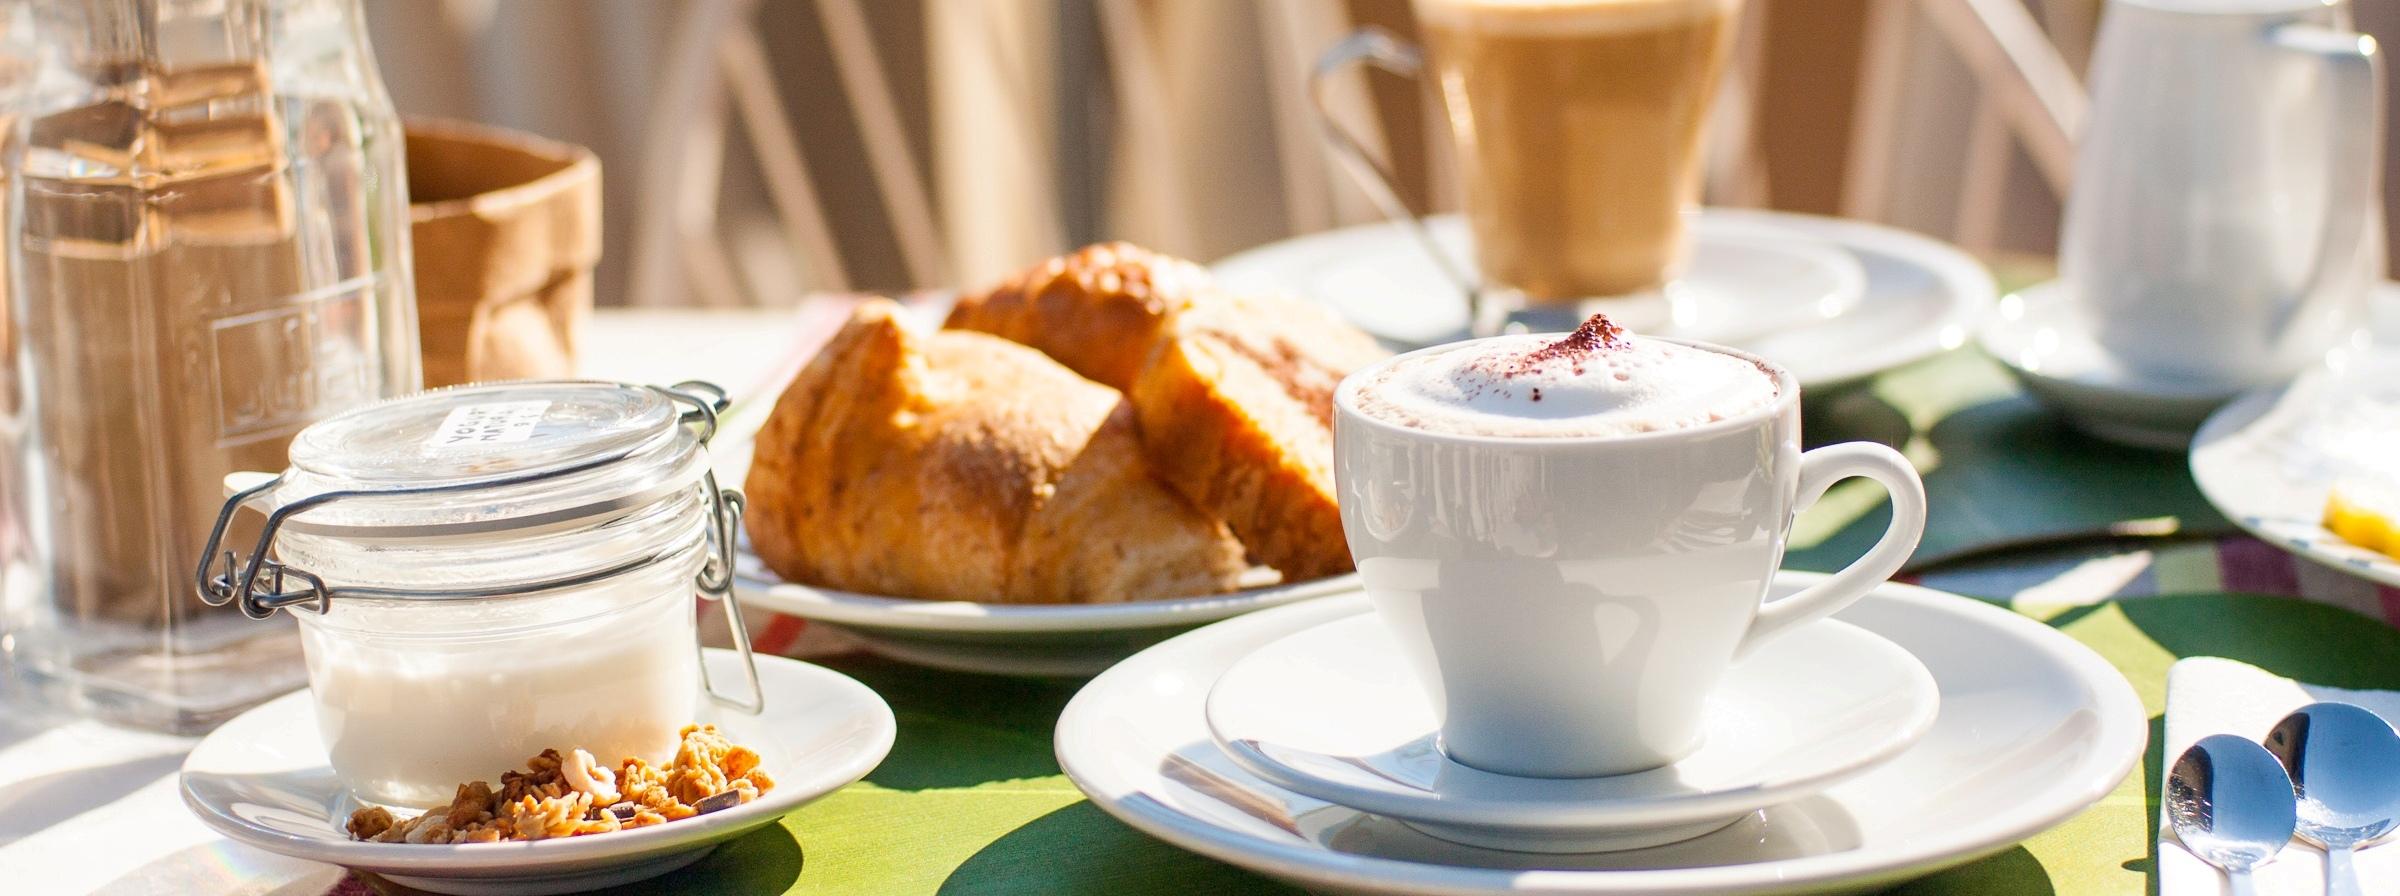 La-Sosta-degli-Artisti-Bed-Breakfast-3-1